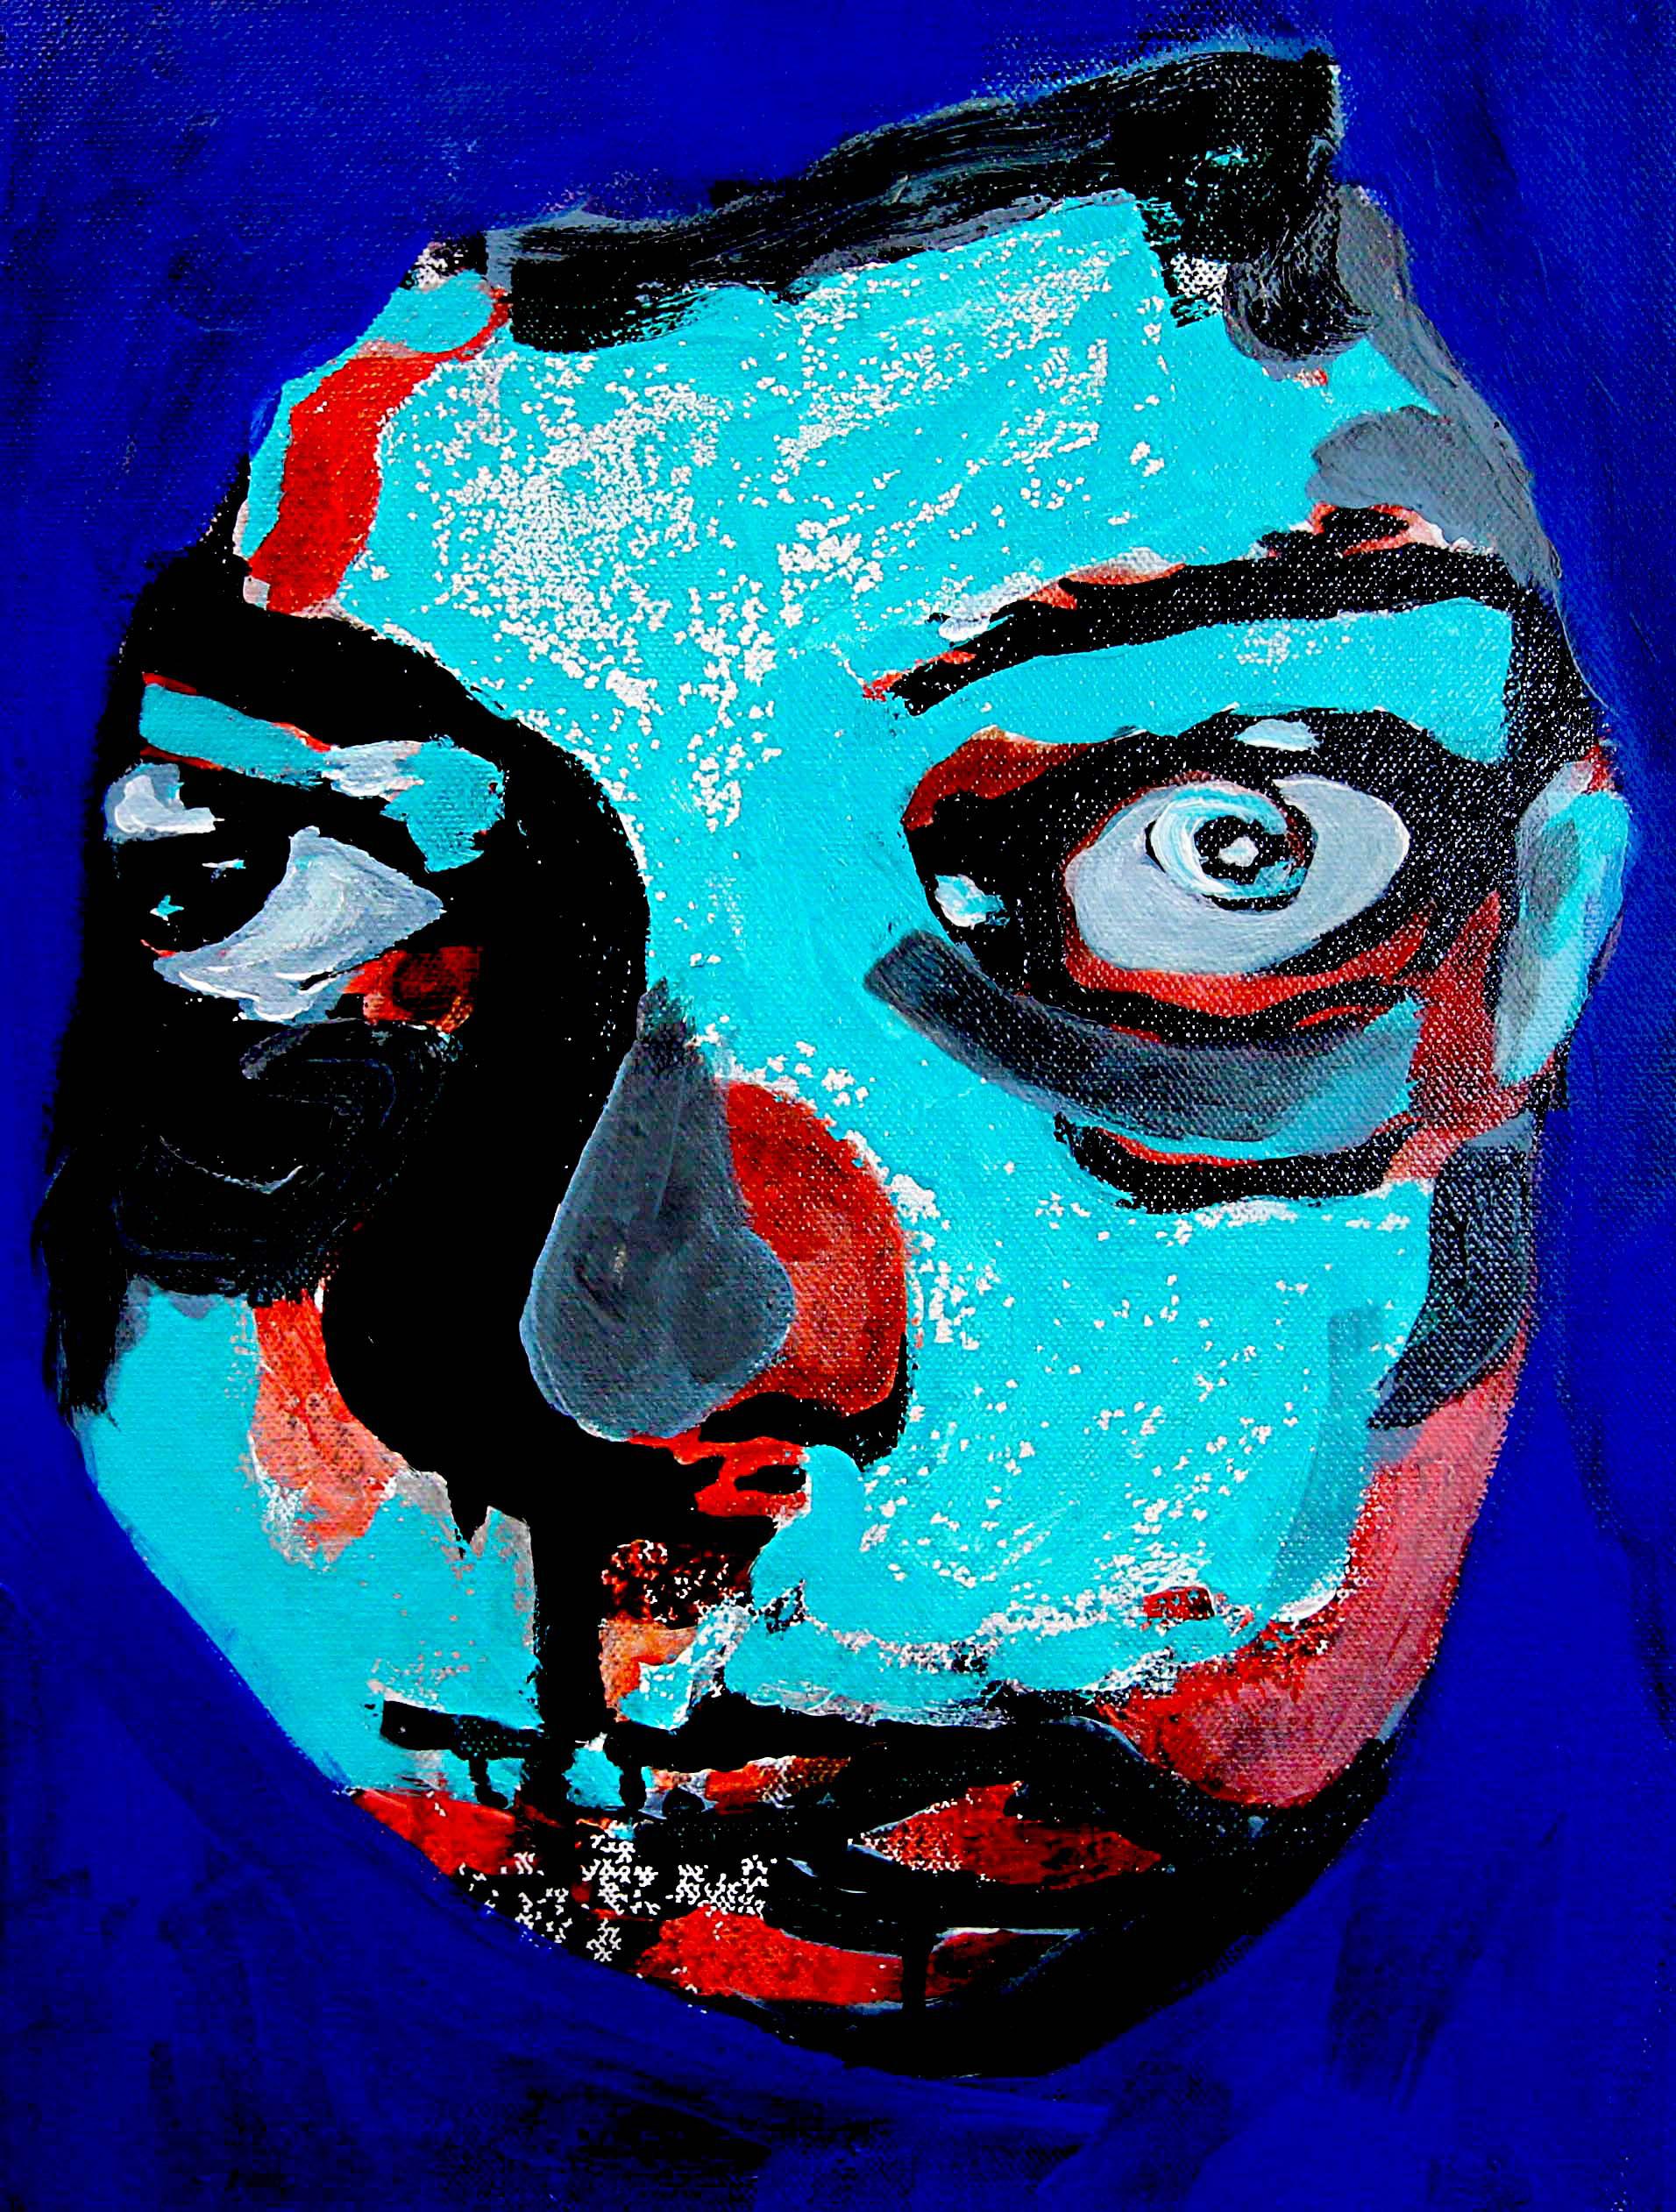 Kadan 2018 | Acrylic on canvas | 40 x 30 cm | £220